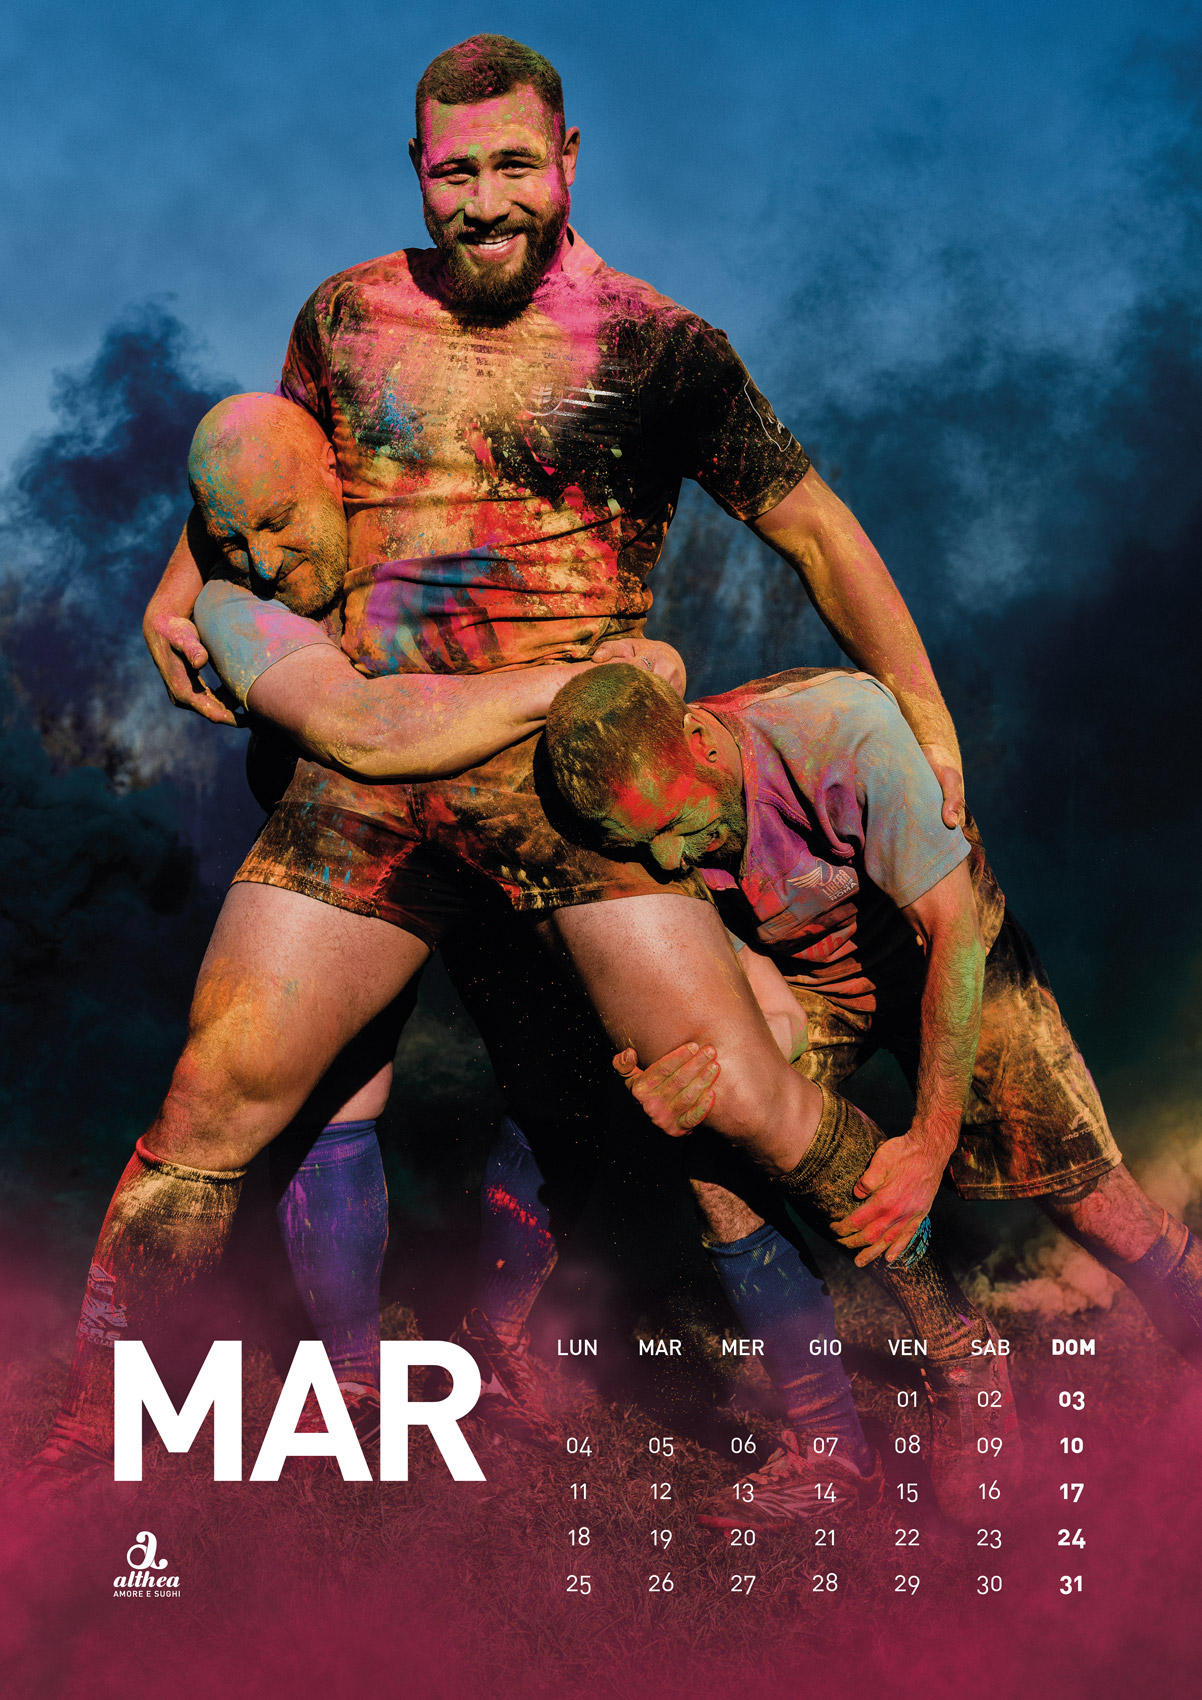 Zebre Rugby Calendario.Rugby Calendario Anti Omofobia Per Le Zebre Foto